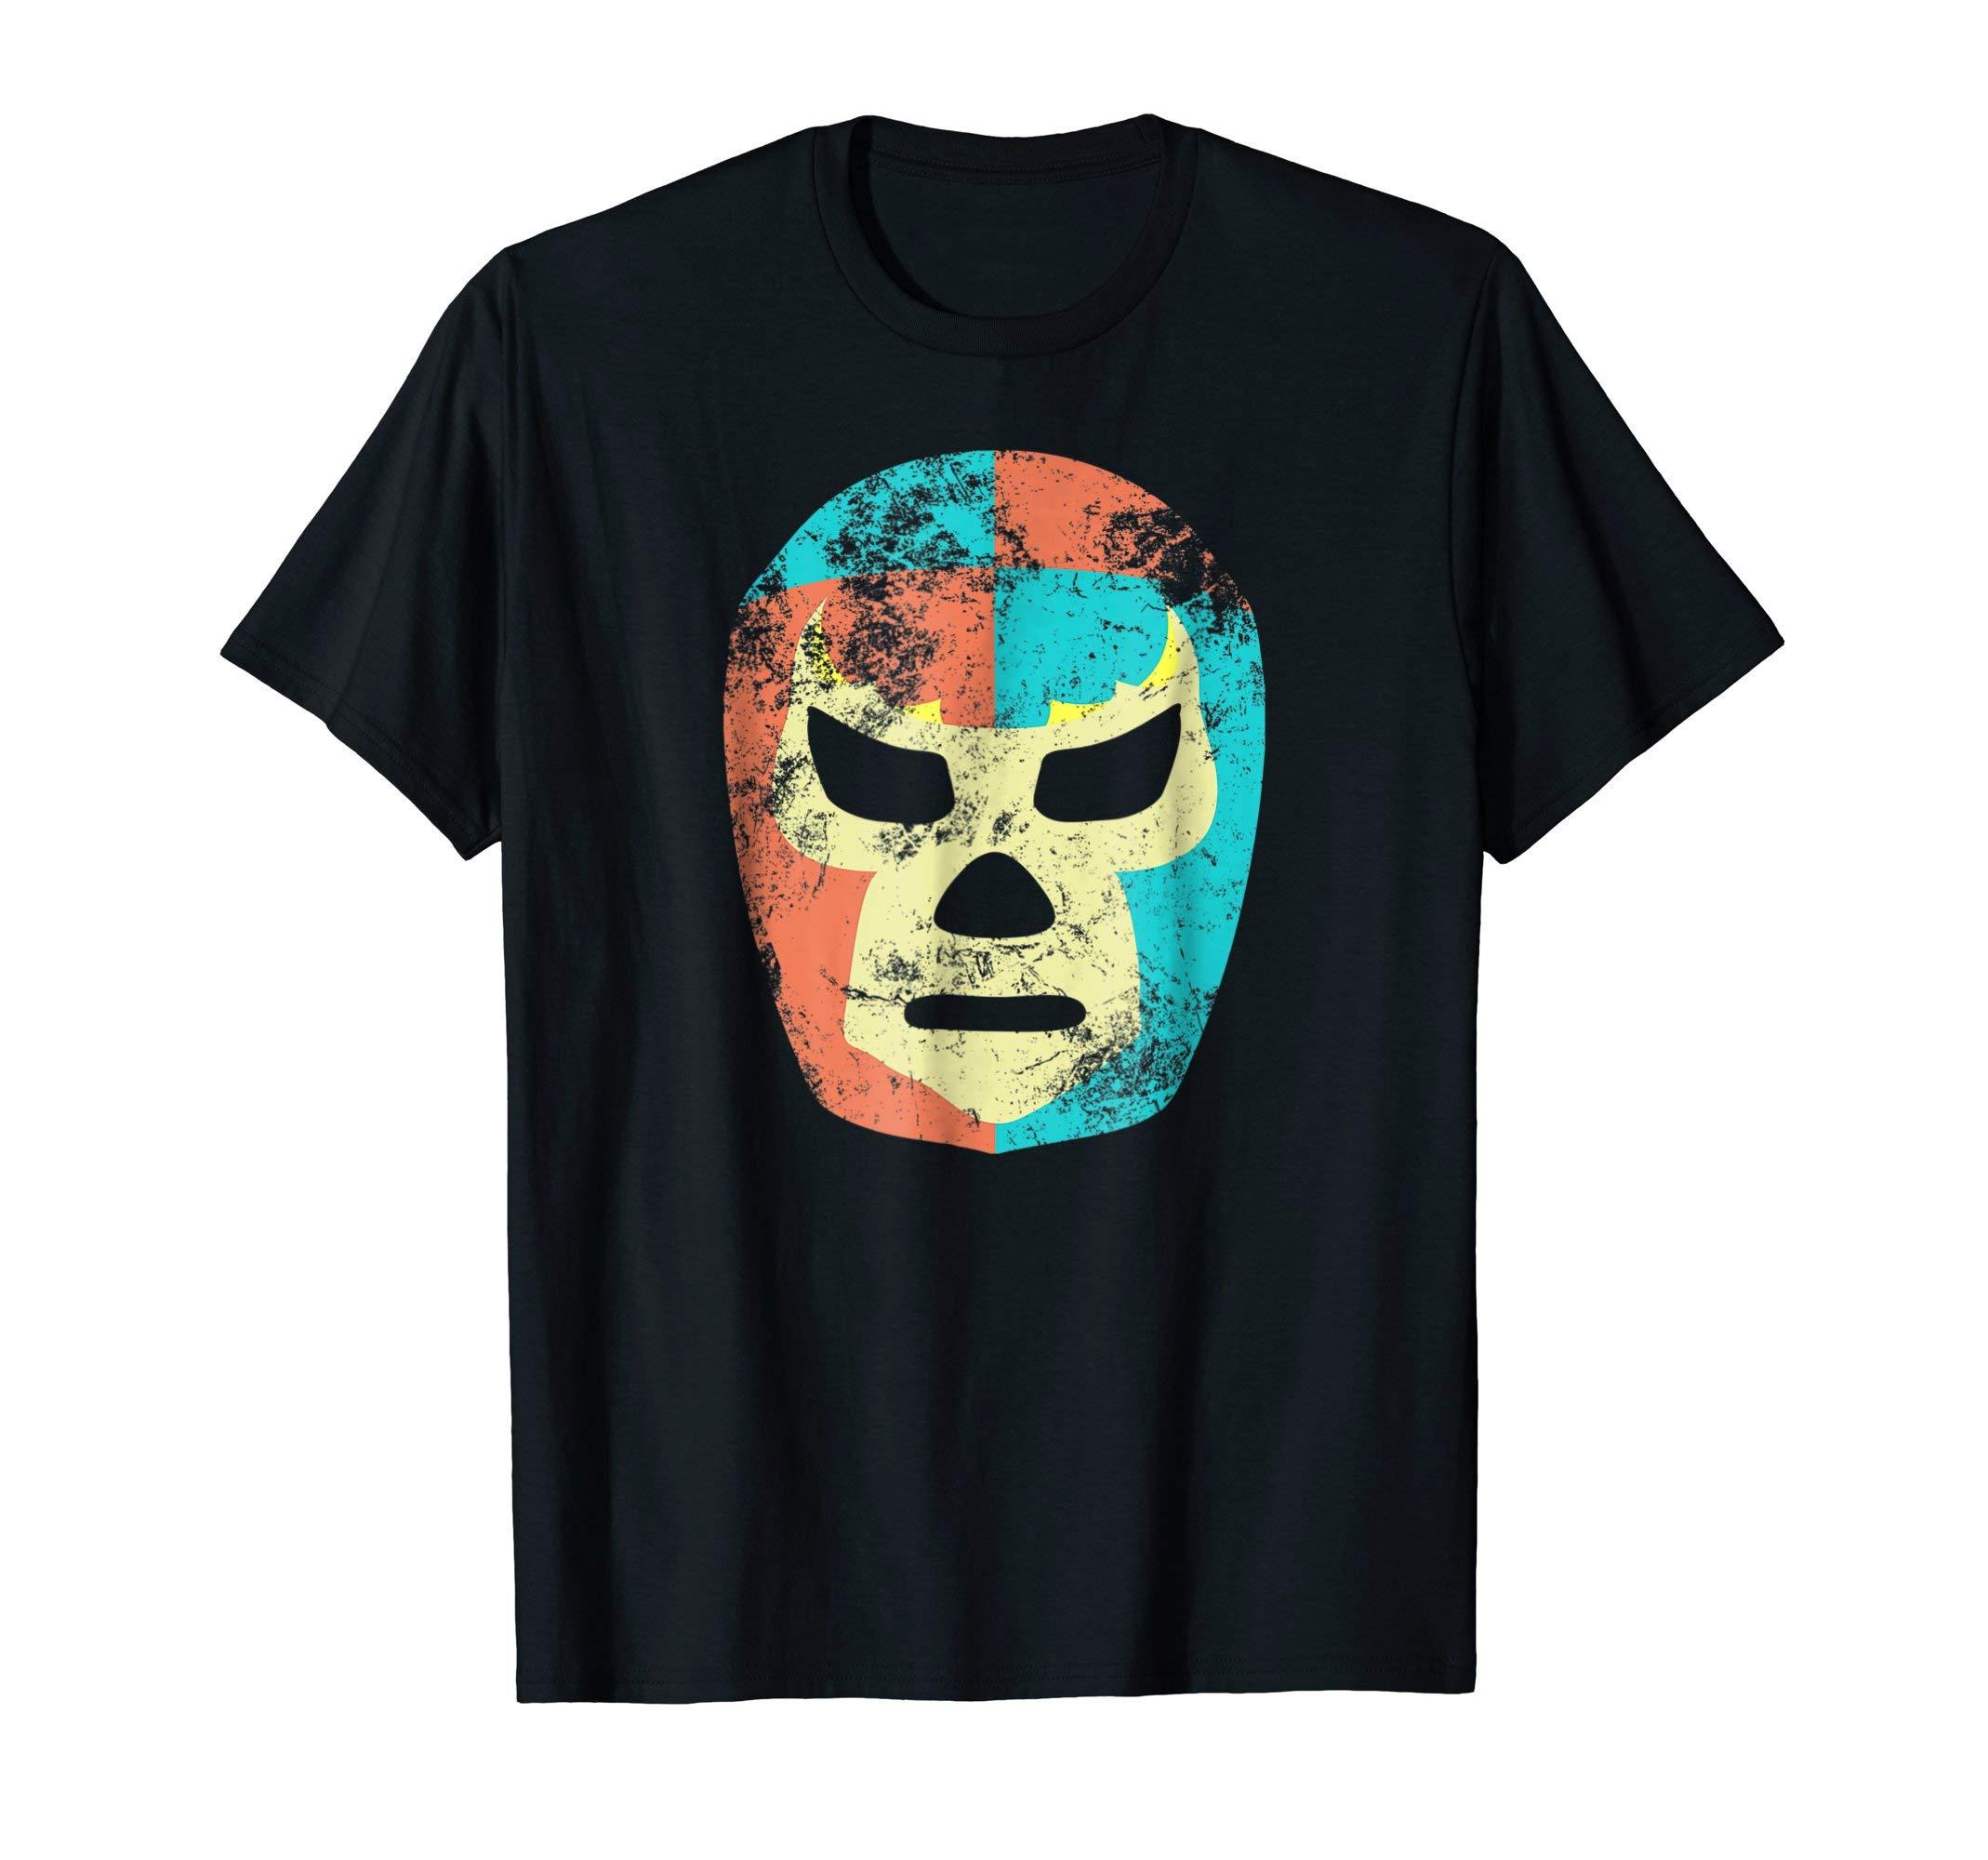 Retro Wrestling Mask Mexican Lucha Libre Luchador T-Shirt by Lucha Libre Luchador Wrestling Mask